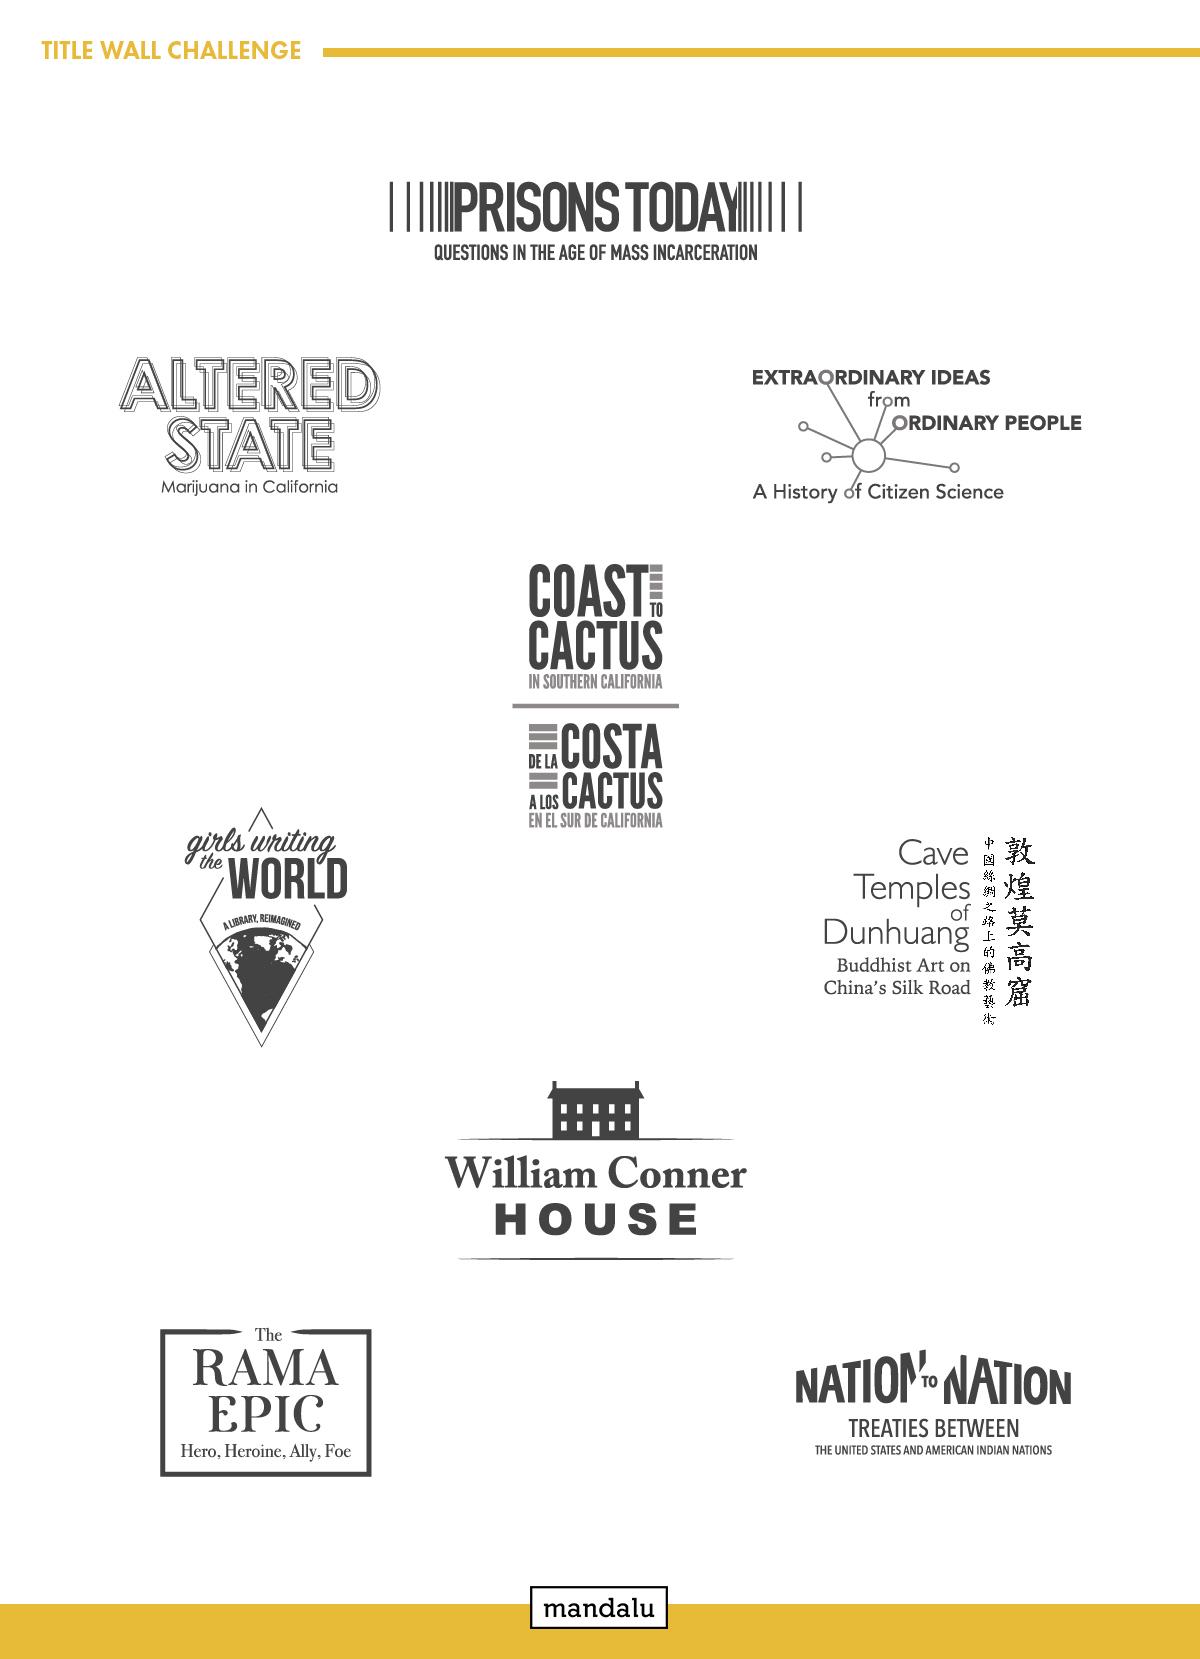 Graphic-Design-Exhibition-Logos-1-9.jpg